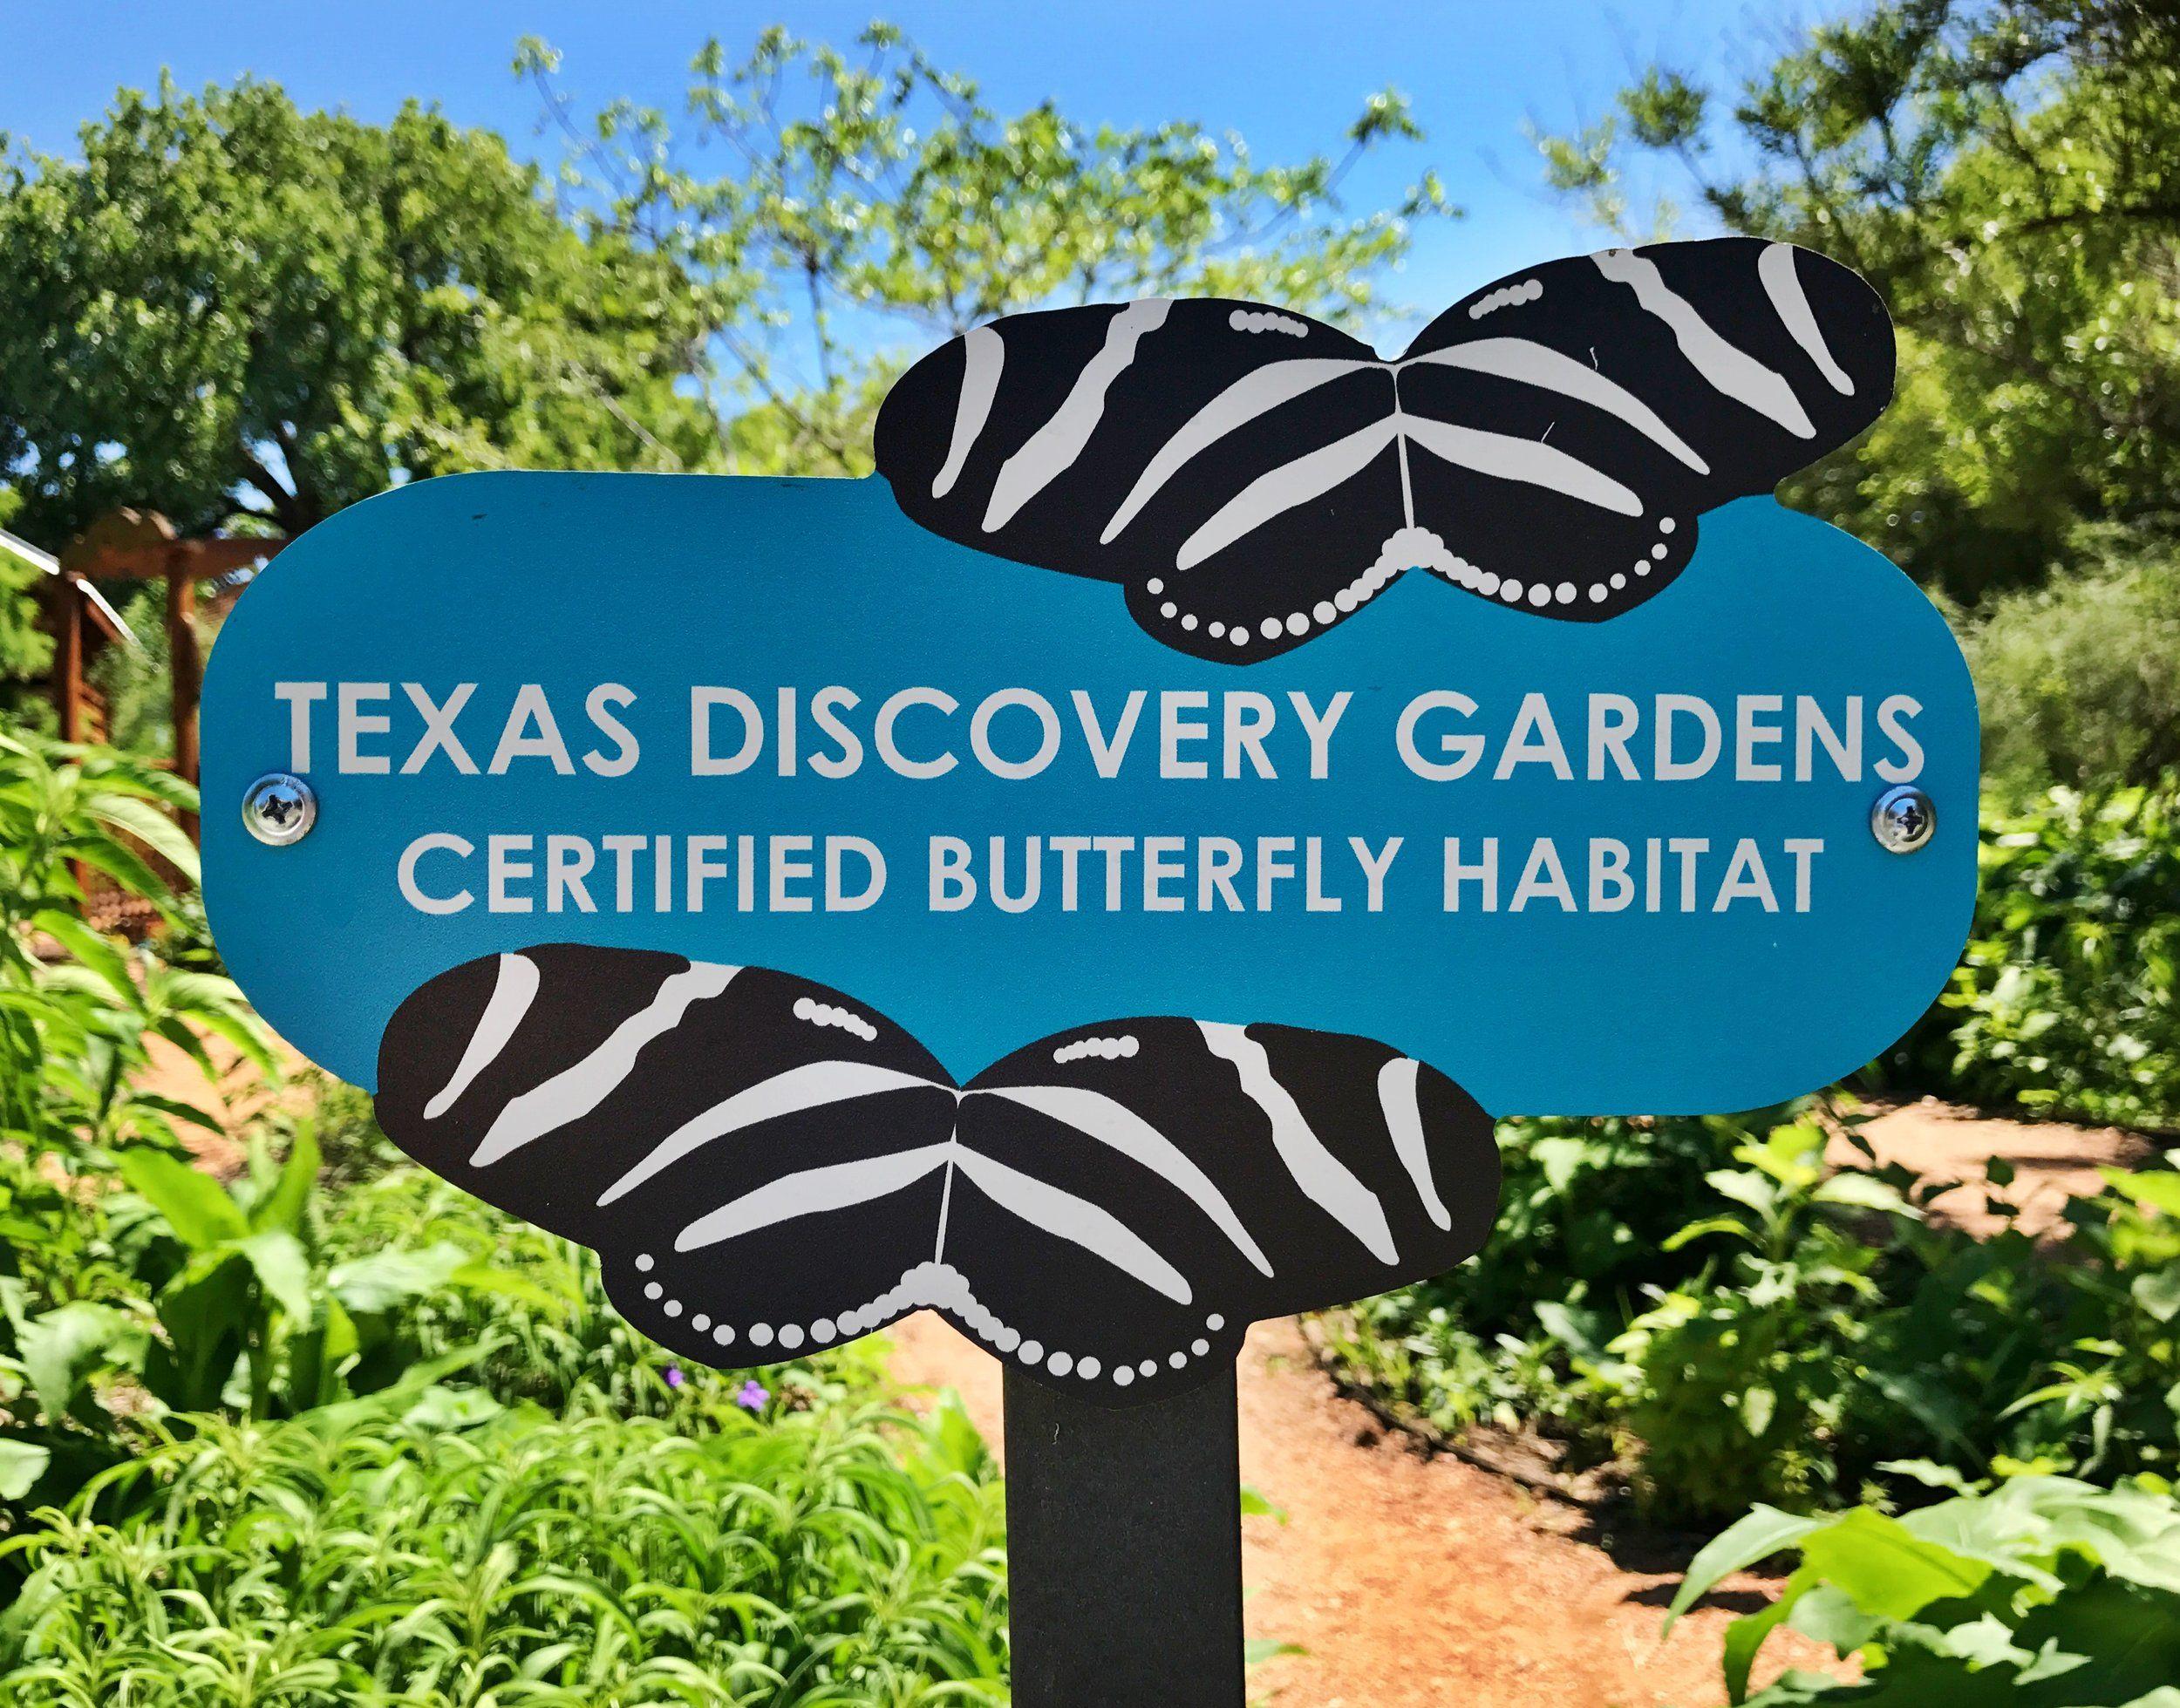 0c0fc9abb5029bead41242ac9e98eaba - Texas Chicken Discovery Gardens Contact Number